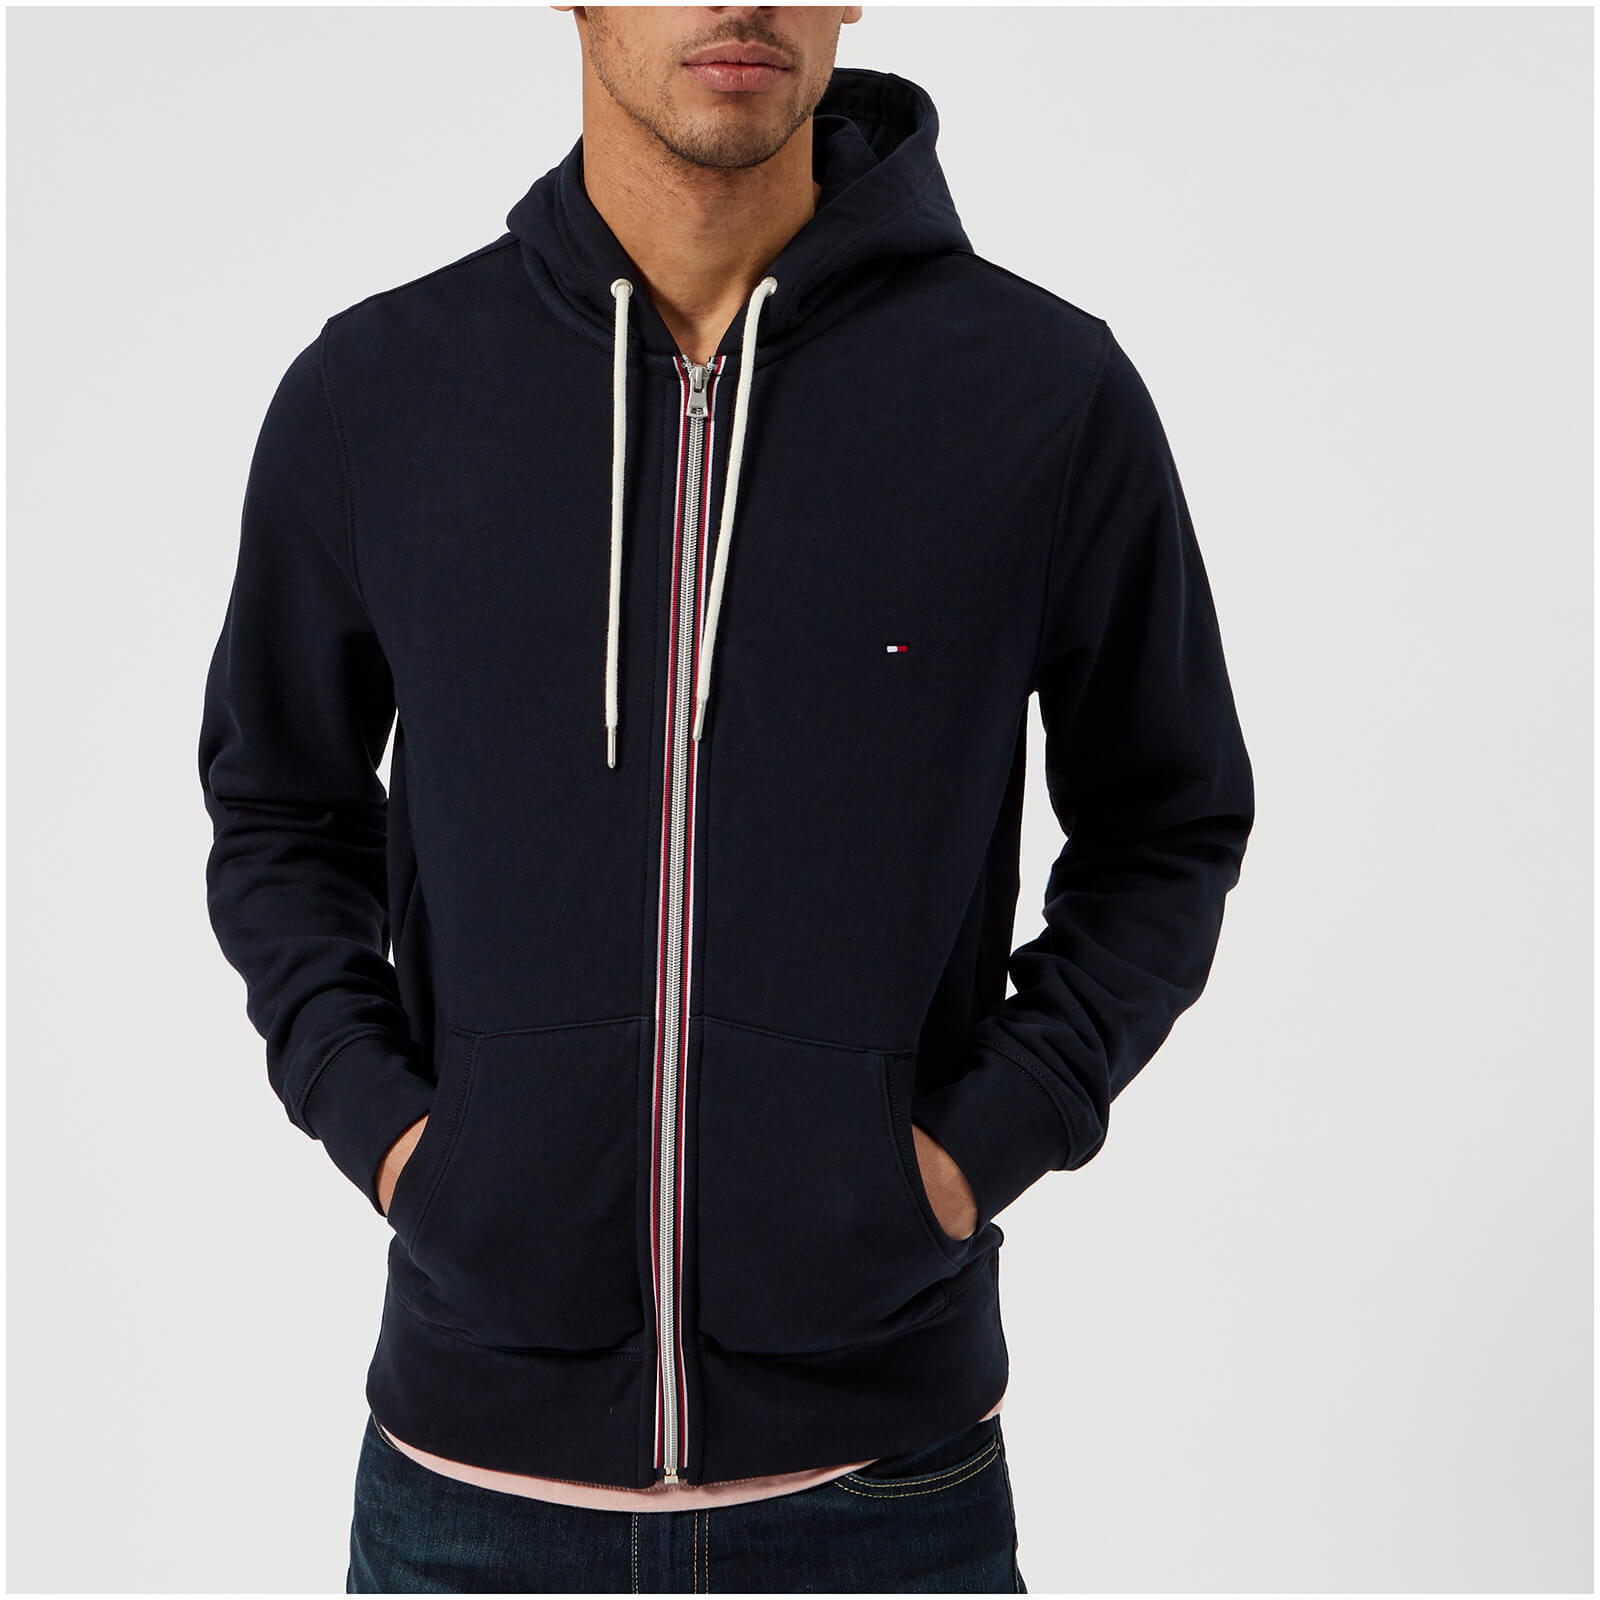 d832f620 Tommy Hilfiger Men's Basic Hooded Zip Through Sweatshirt - Midnight Mens  Clothing | TheHut.com